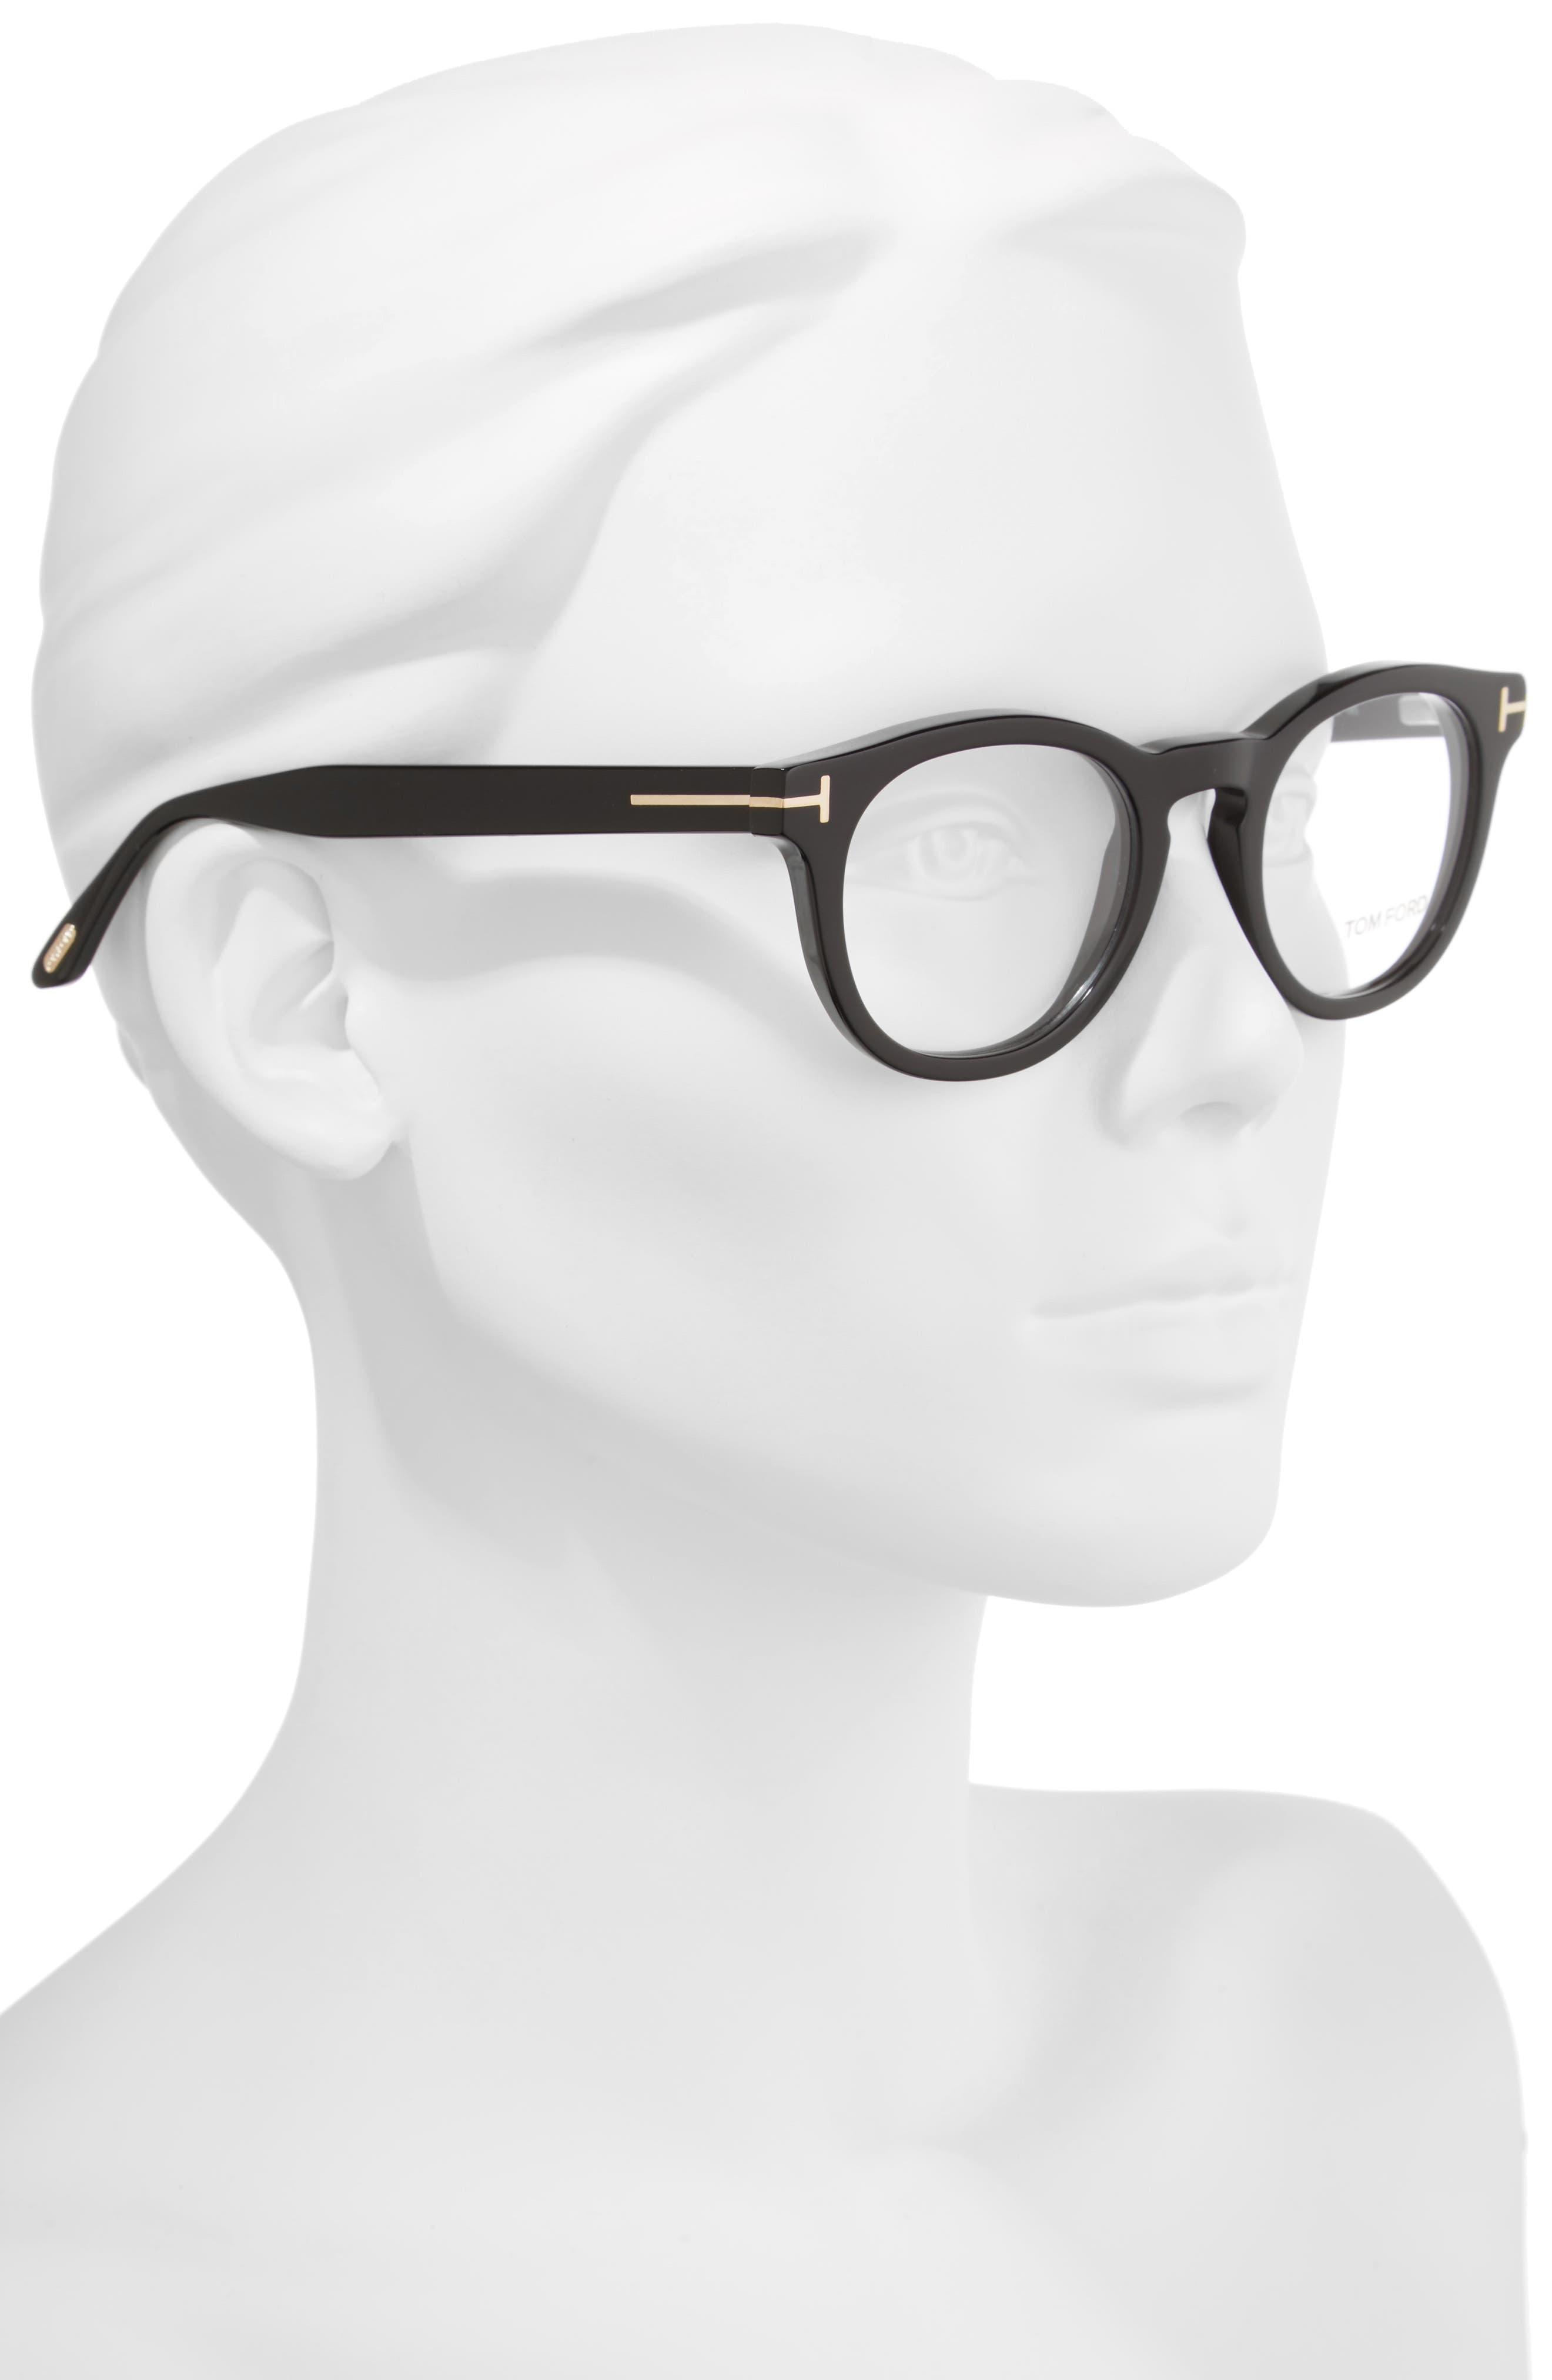 48mm Round Optical Glasses,                             Alternate thumbnail 2, color,                             001